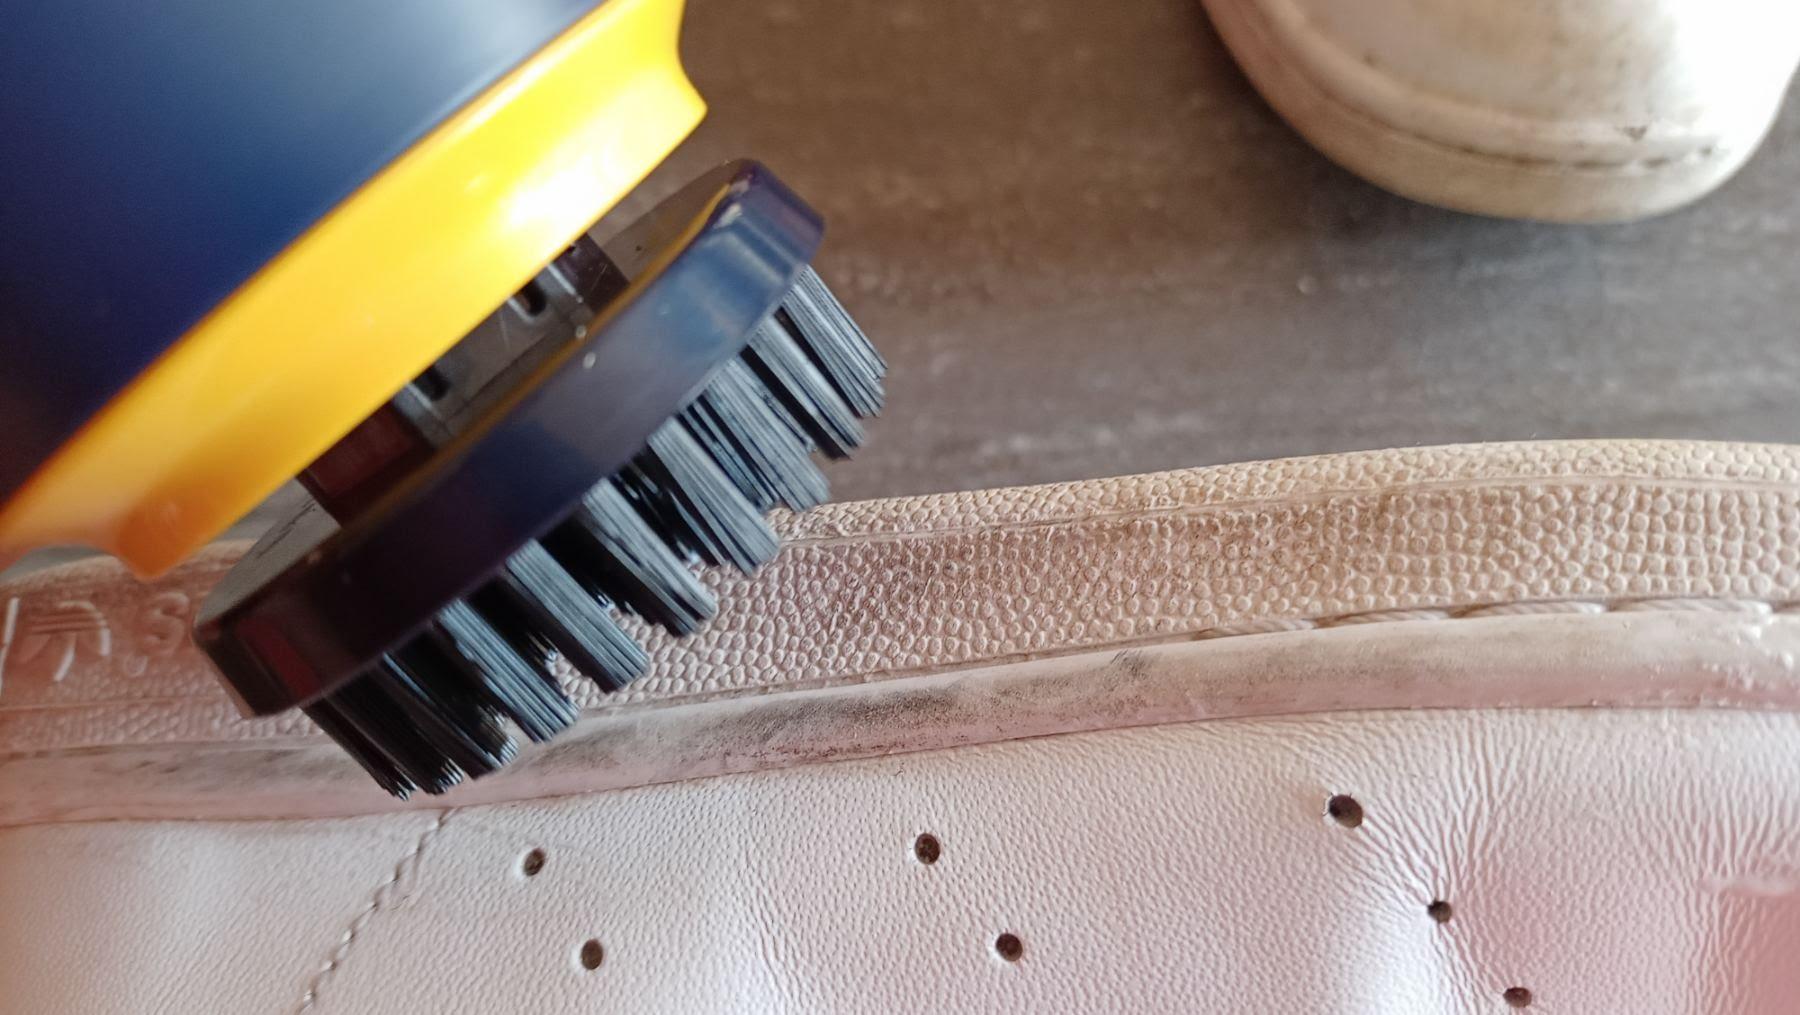 Sneakers Cleaner Philips - brosse dure